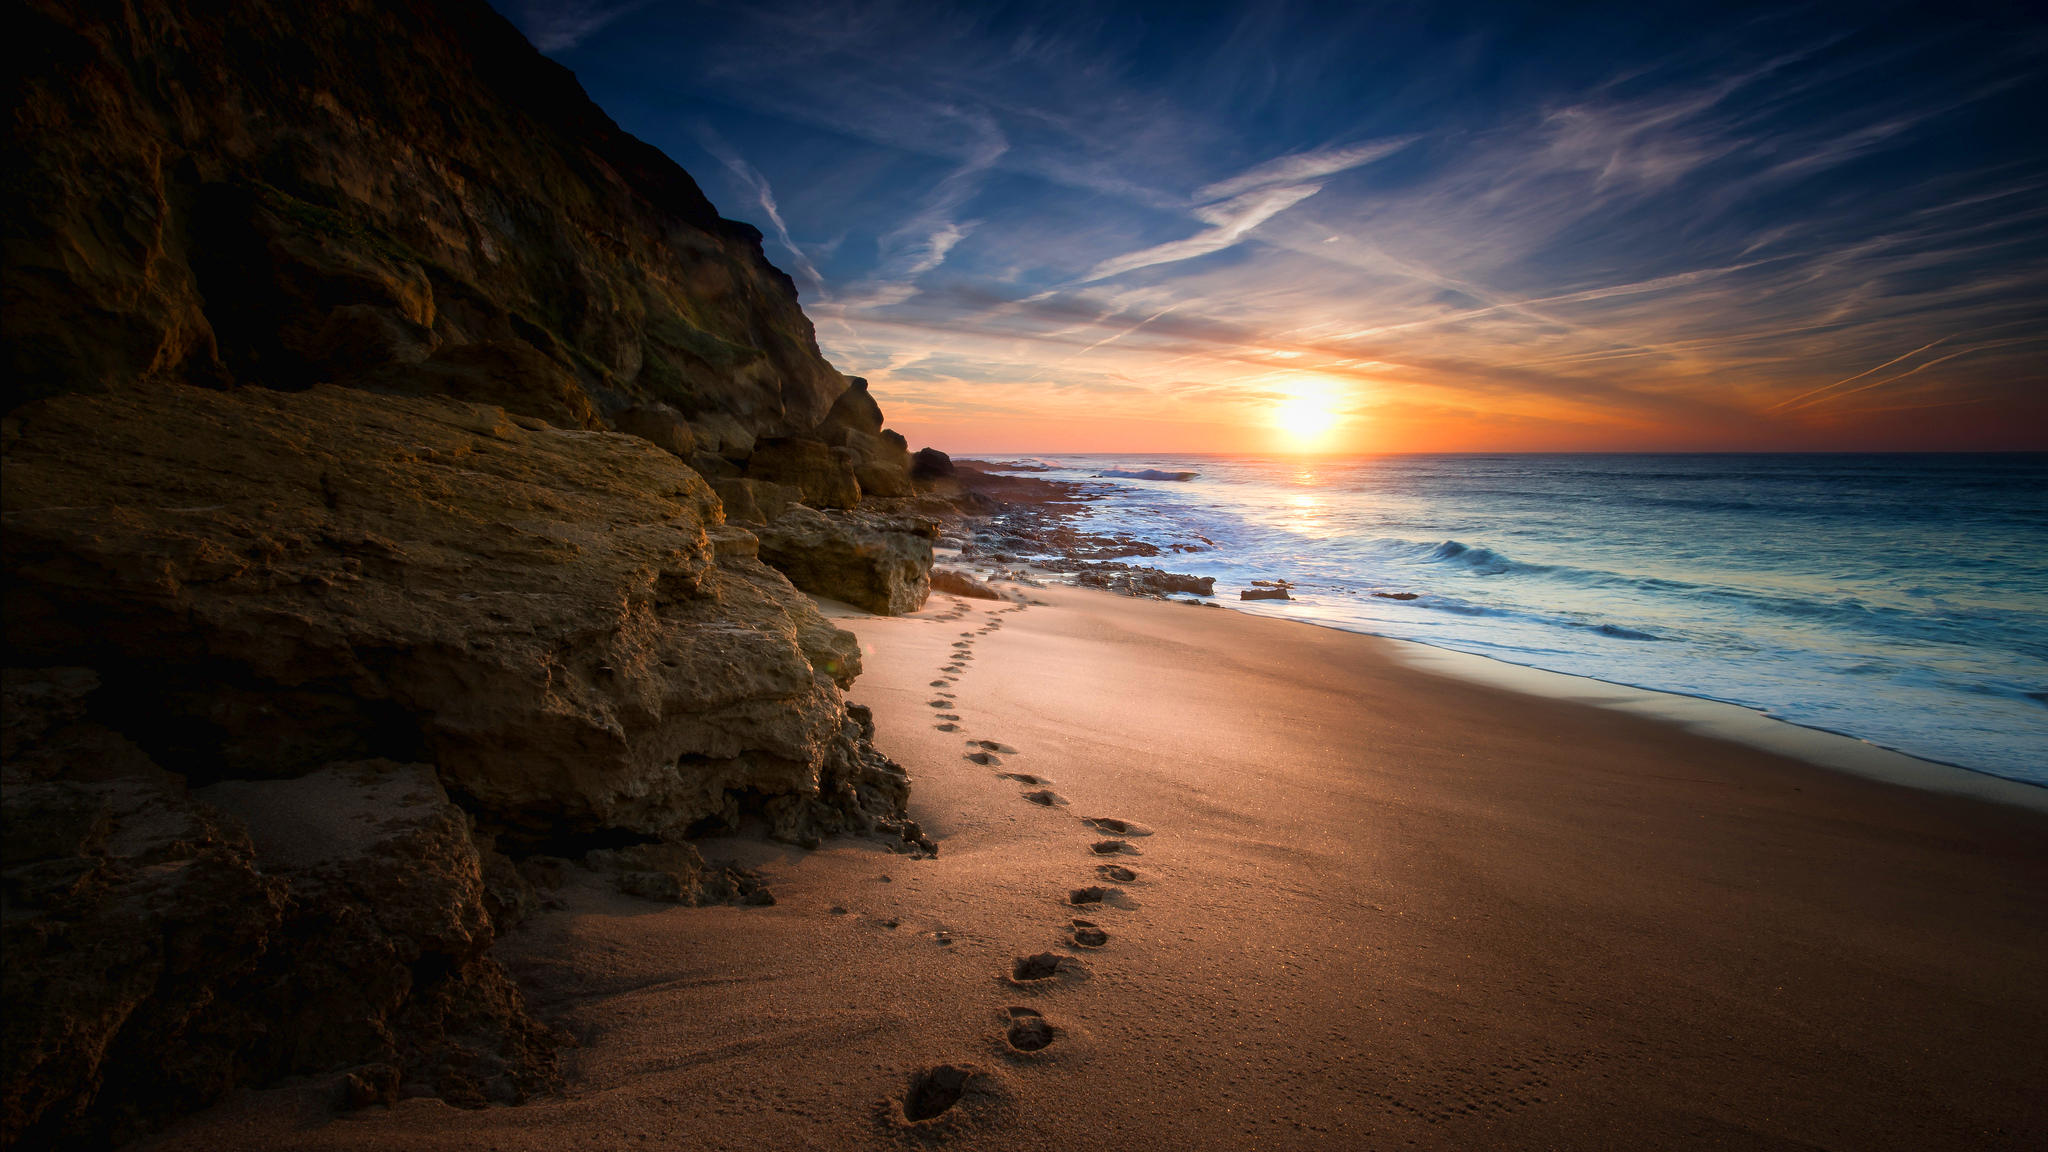 обои море, закат, берег, скалы картинки фото